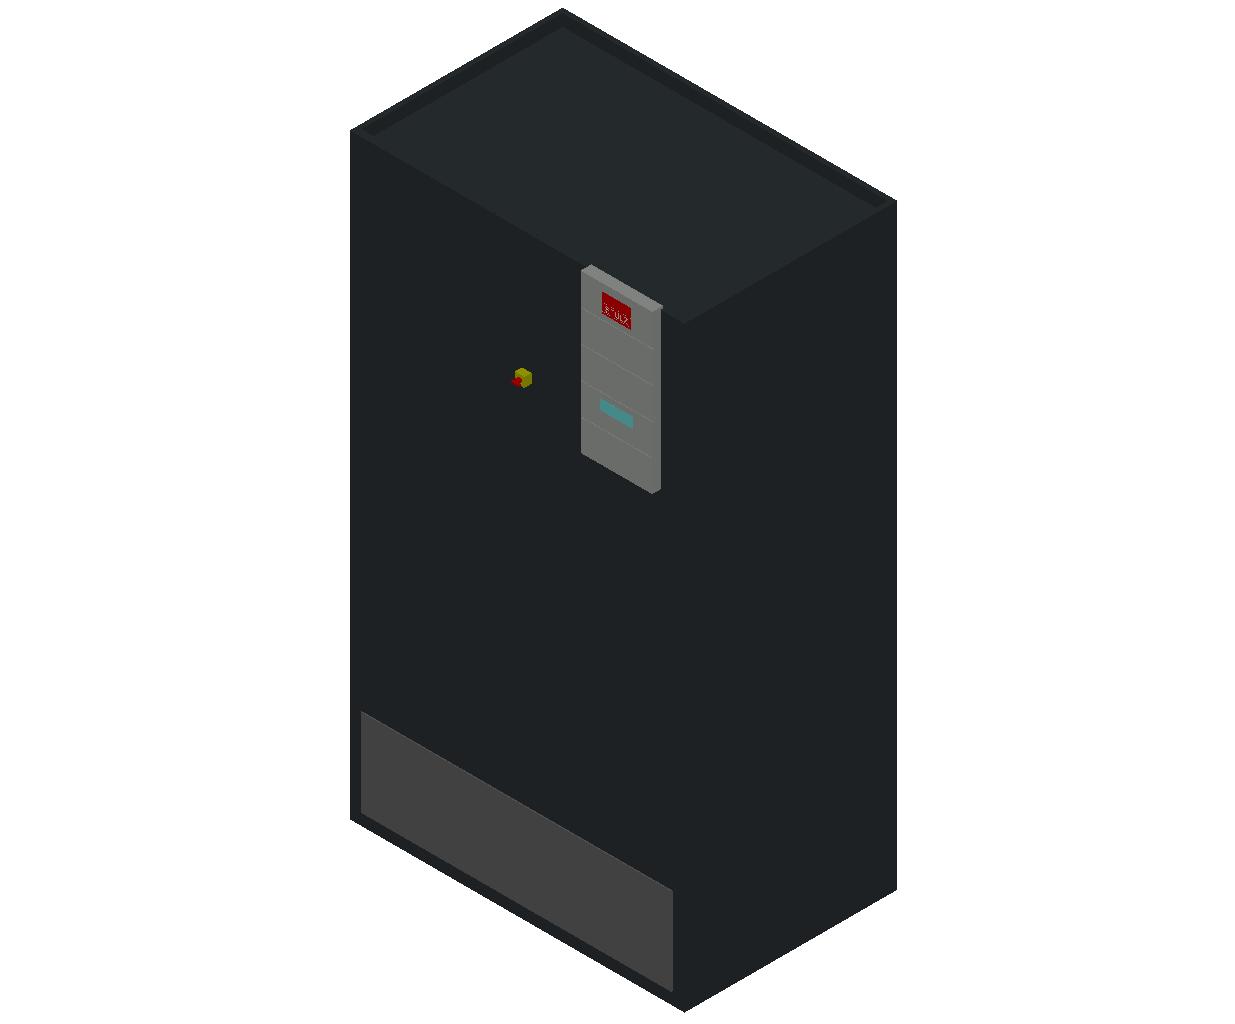 HC_Air Conditioner_Indoor Unit_MEPcontent_STULZ_CyberAir 3PRO_ASR_CW_ASR_610_CW_INT-EN.dwg